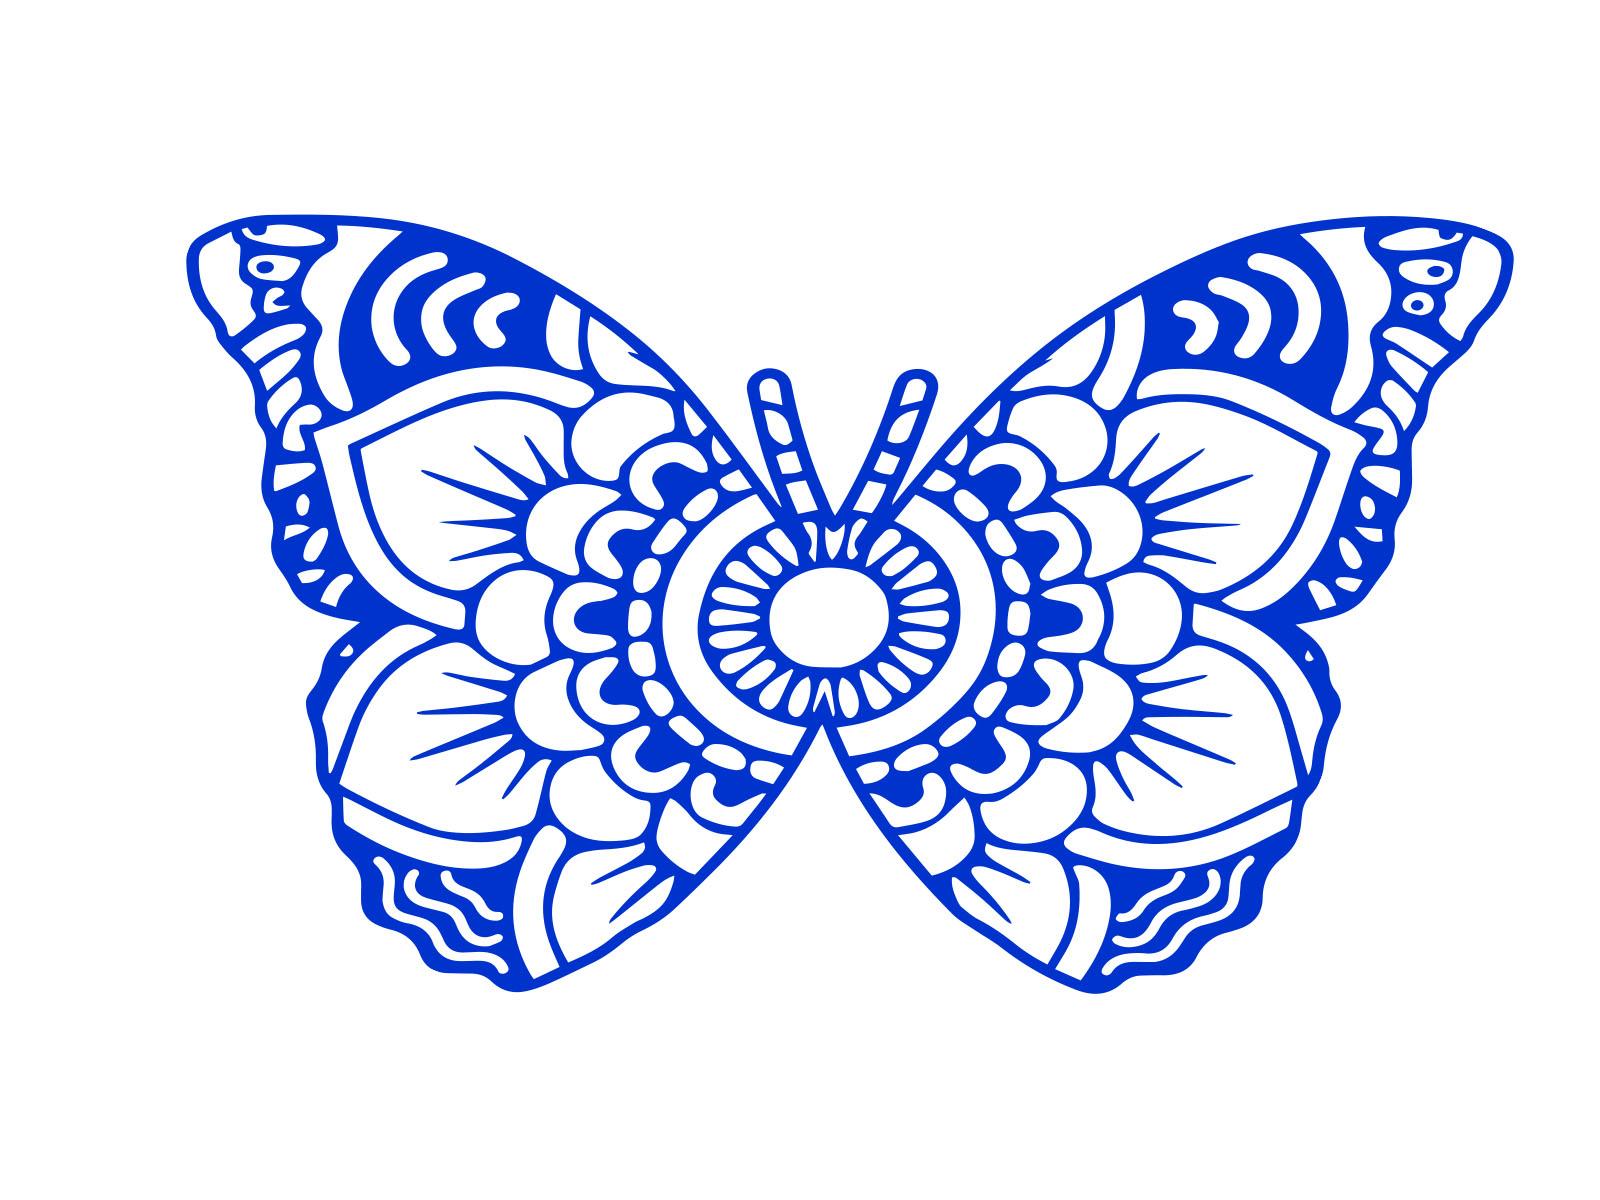 Download butterfly silhouette svg bundle Mandala by criske bankat ...